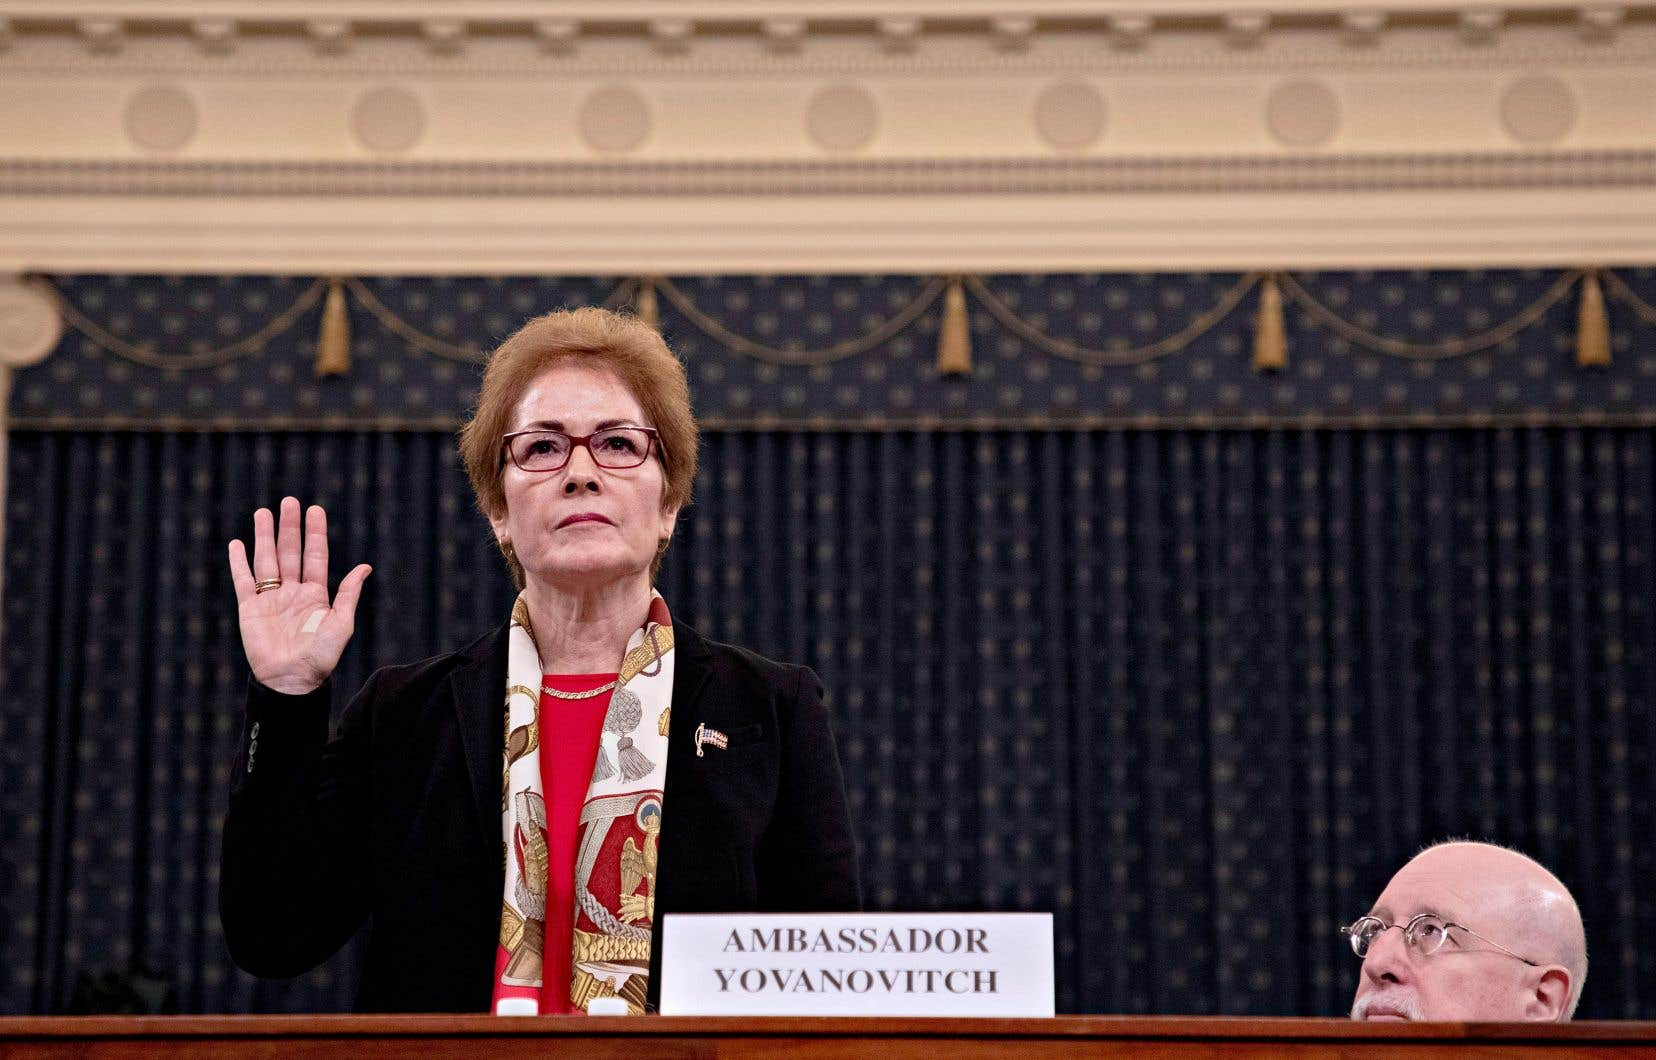 L'ancienne ambassdrice des États-Unis en Ukraine,Marie Yovanovitch